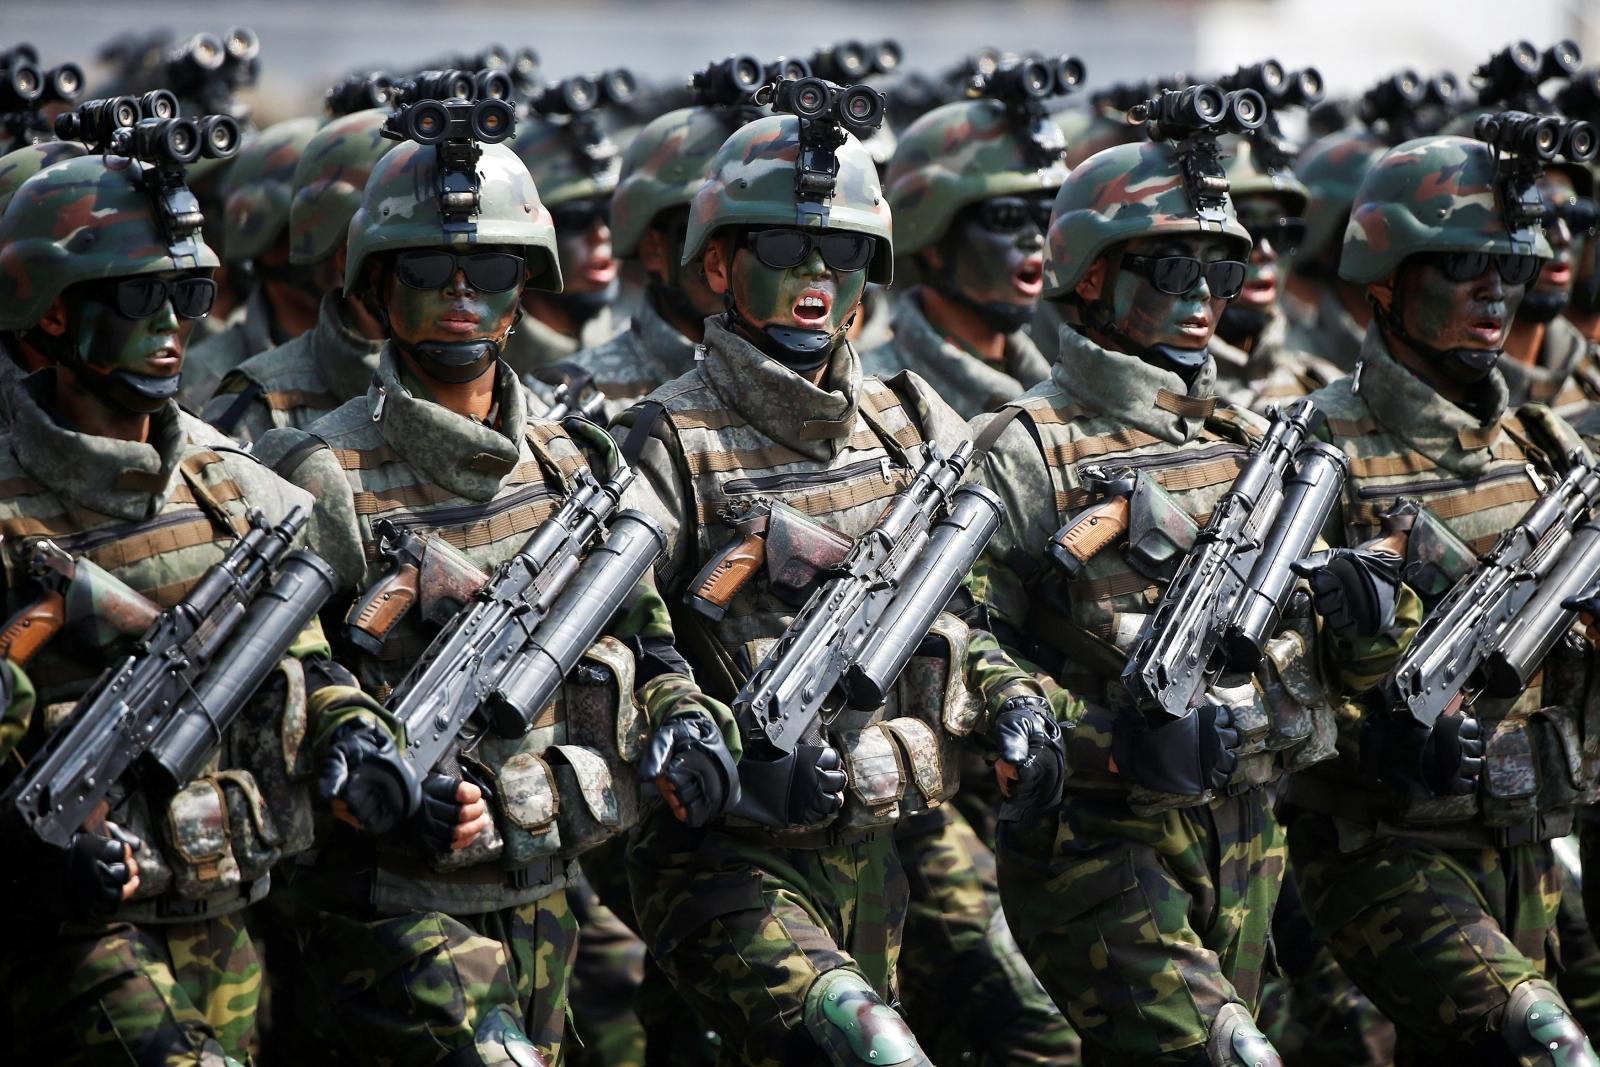 North Korea military movement and parade